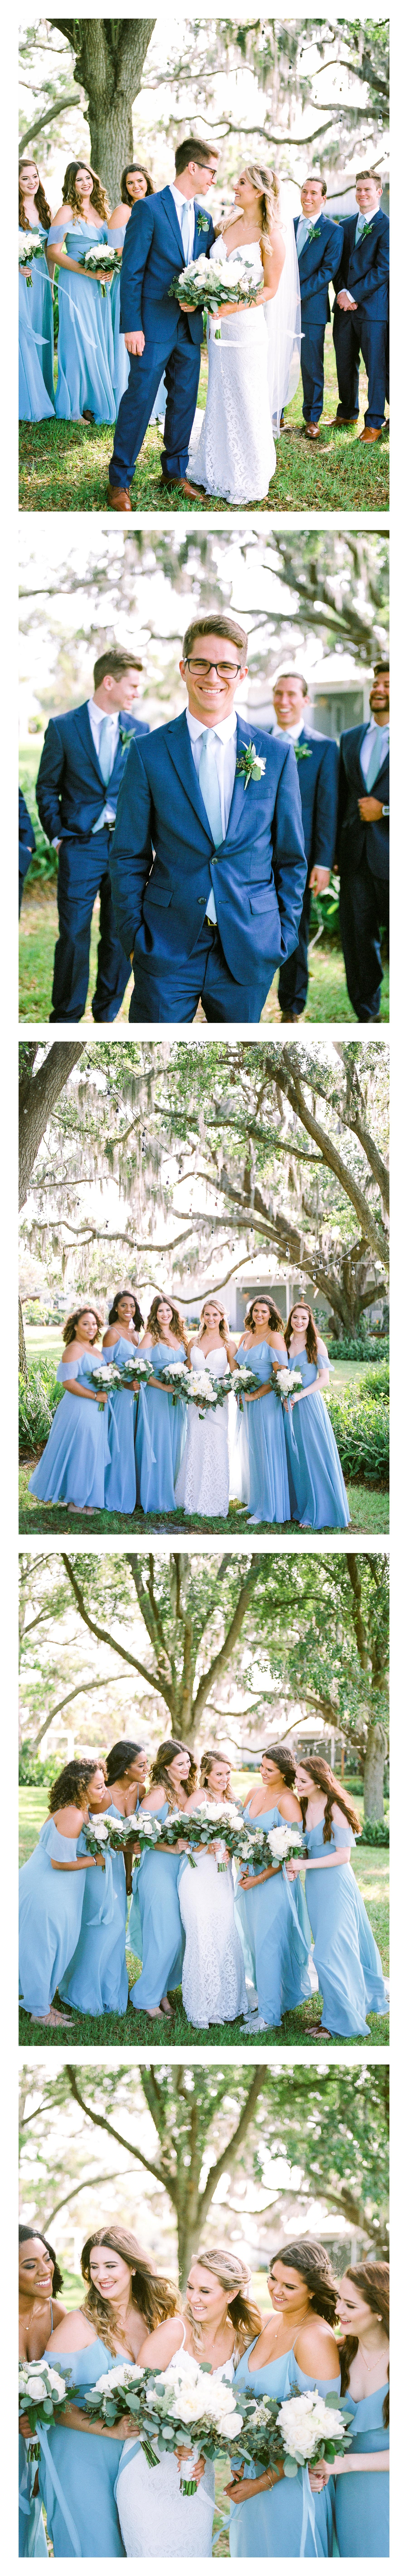 up-the-creek-farms-valkaria-fl-bridal-party-wedding-photos